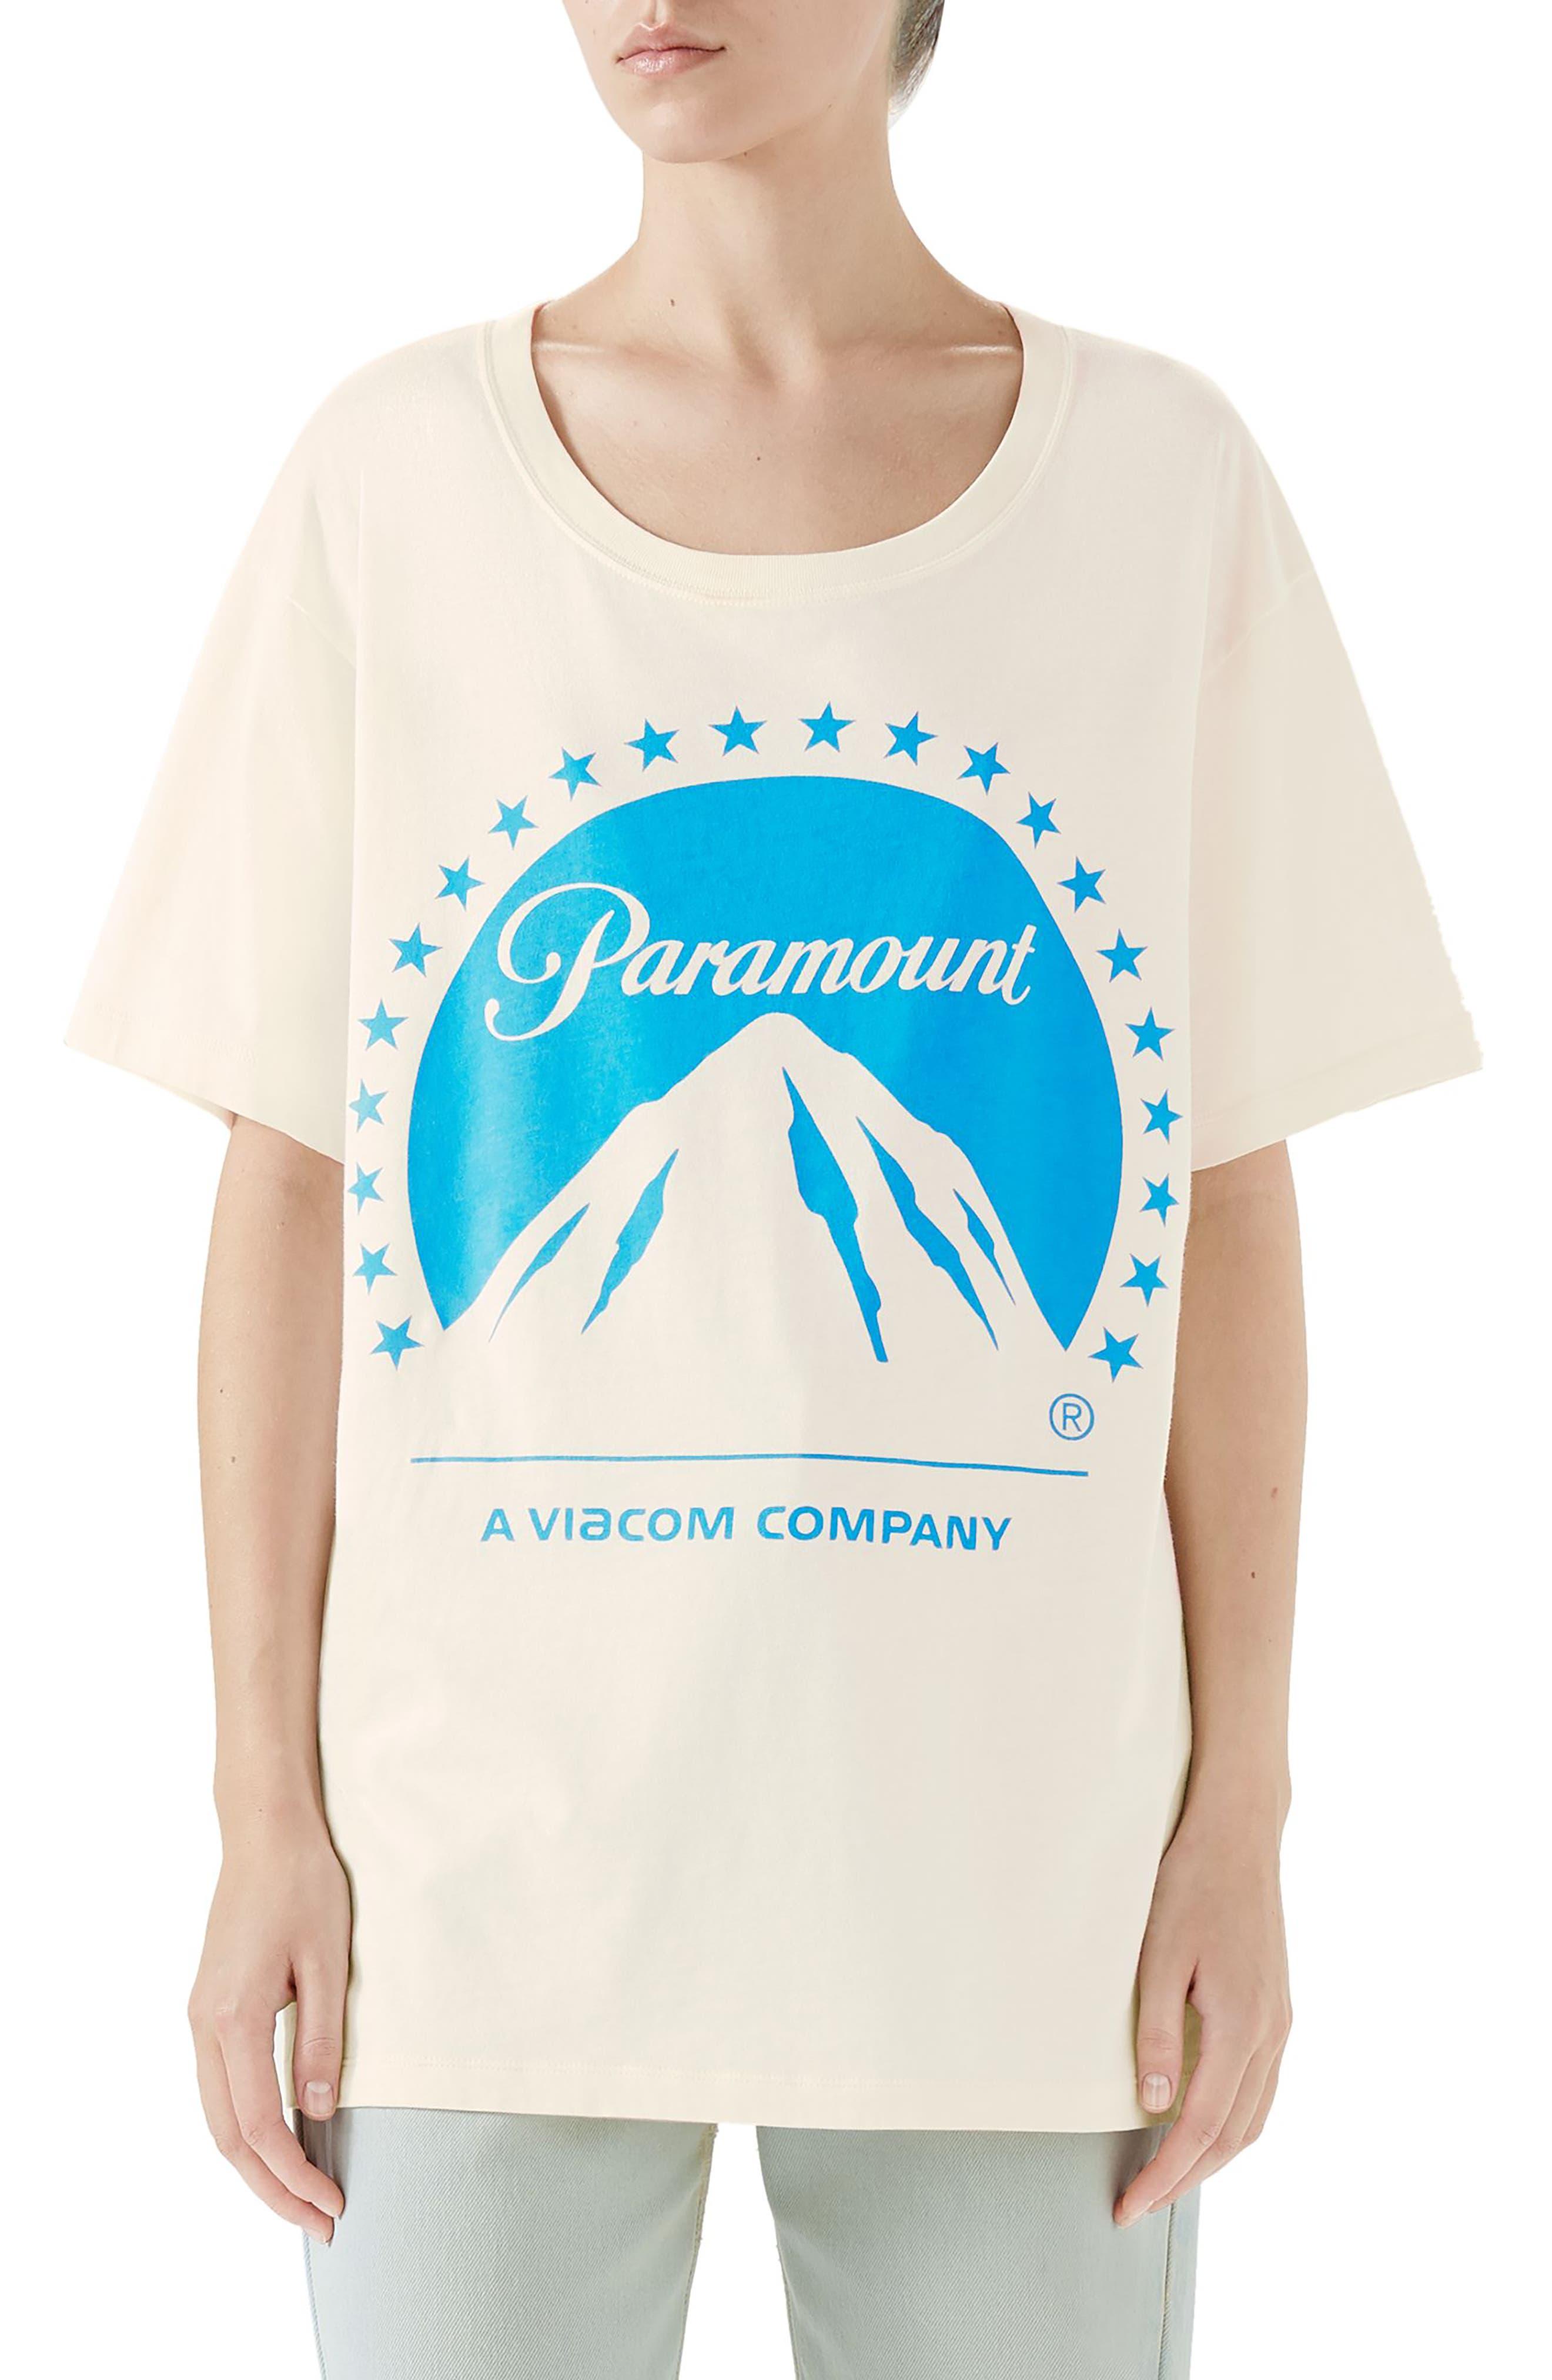 GUCCI Paramount Print Tee, Main, color, IVORY